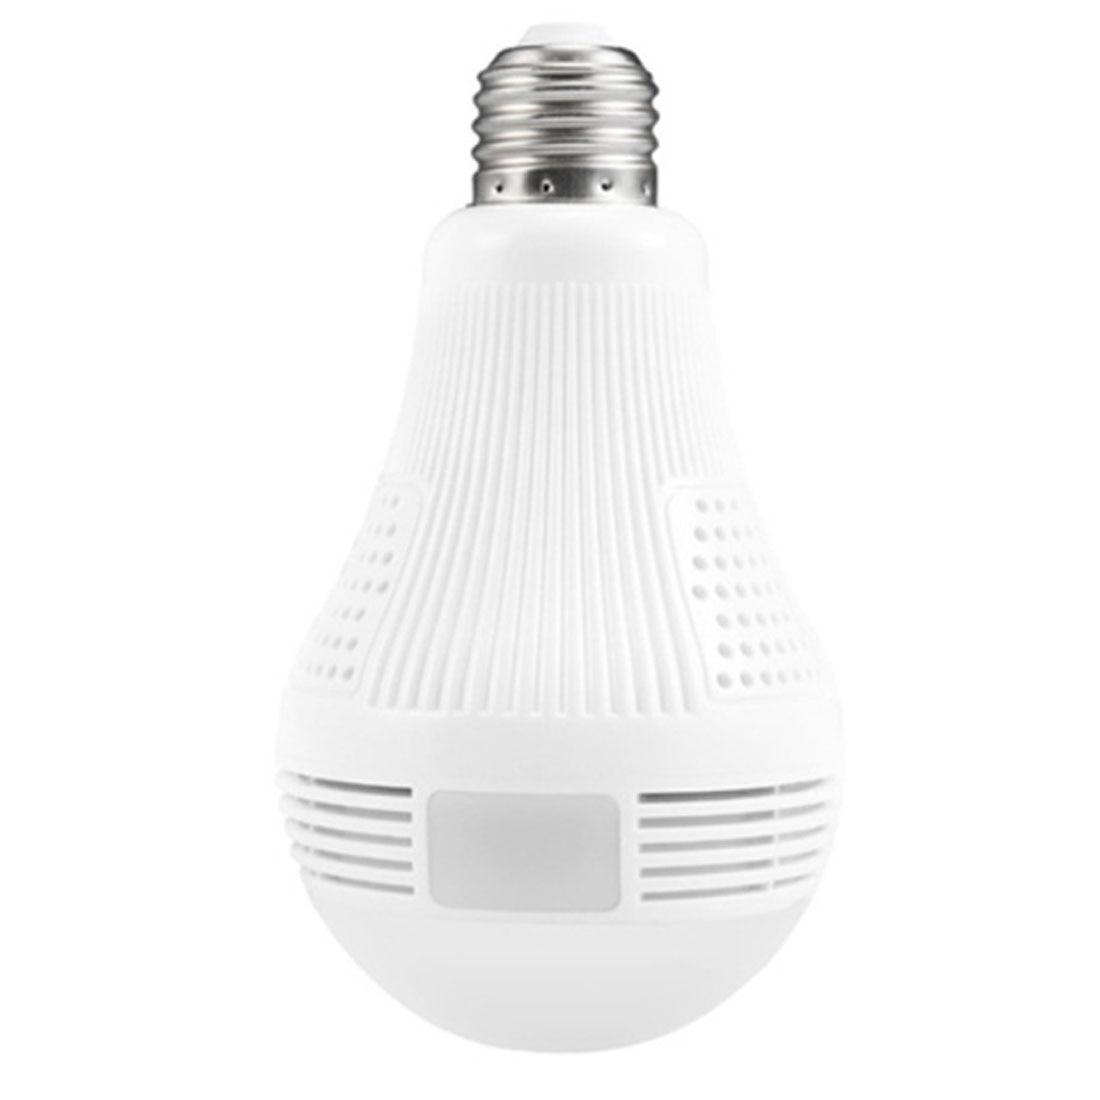 Inpelanyu 960p 360 Security Wifi Camera Lamp Panoramic Bulb IP CCTV Video Surveillance Fisheye HD Night Vision TWO Talk